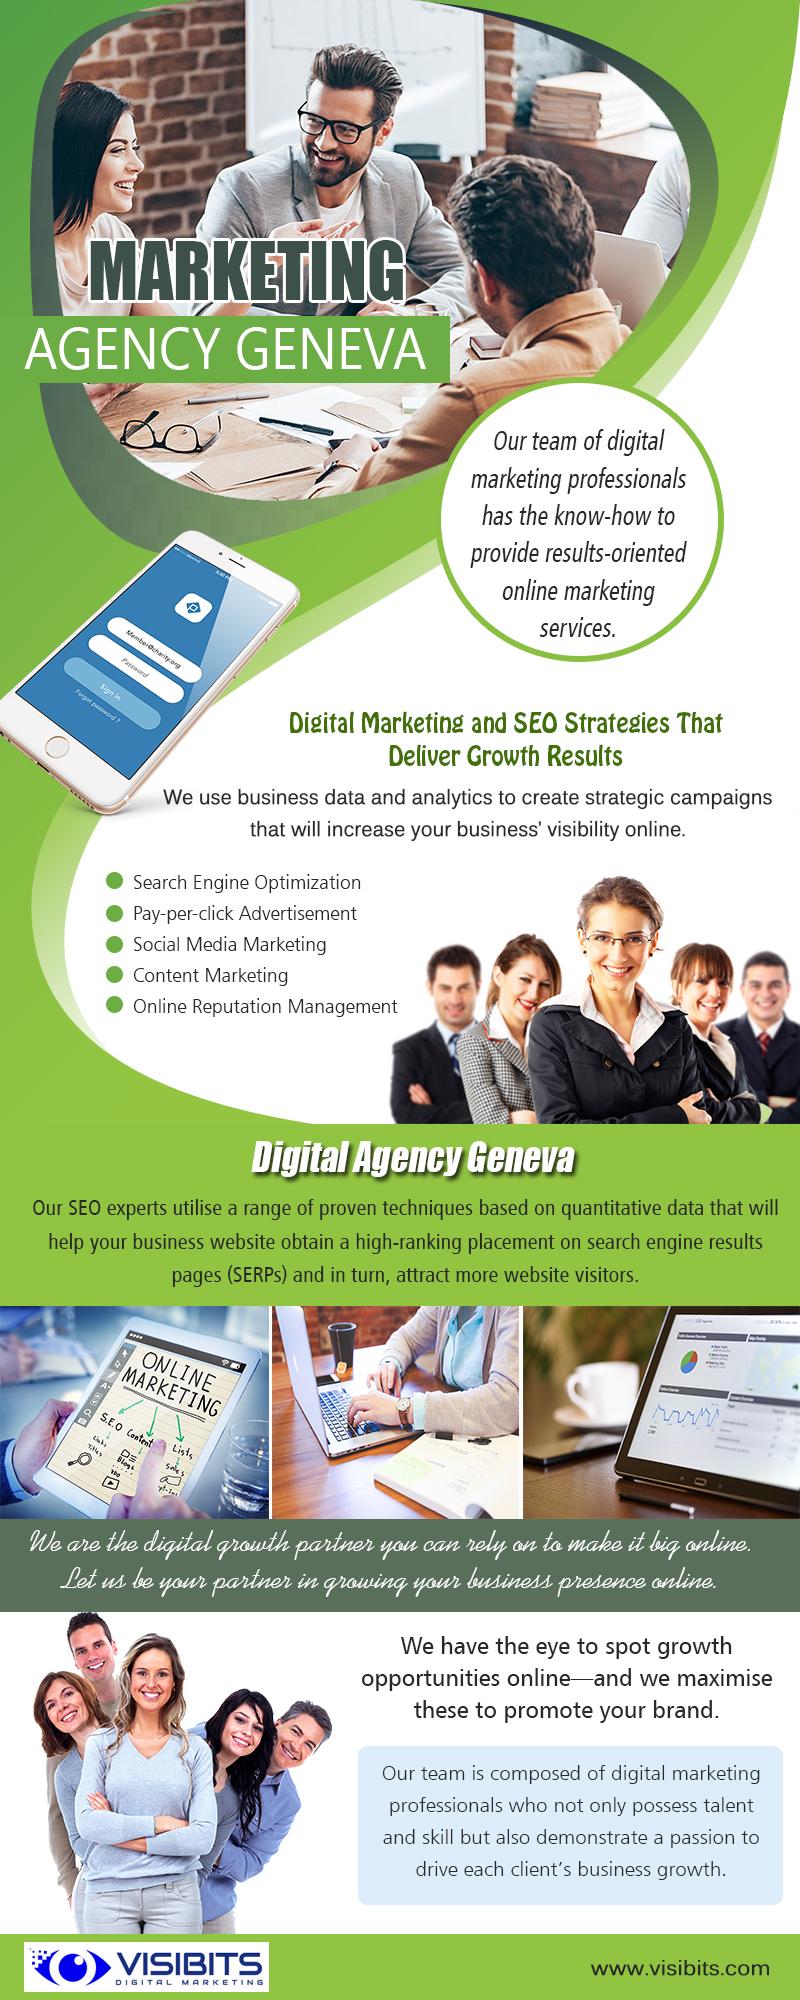 Digital Marketing Agency Geneva | Call — 41 22 575 39 51 | visibits.com